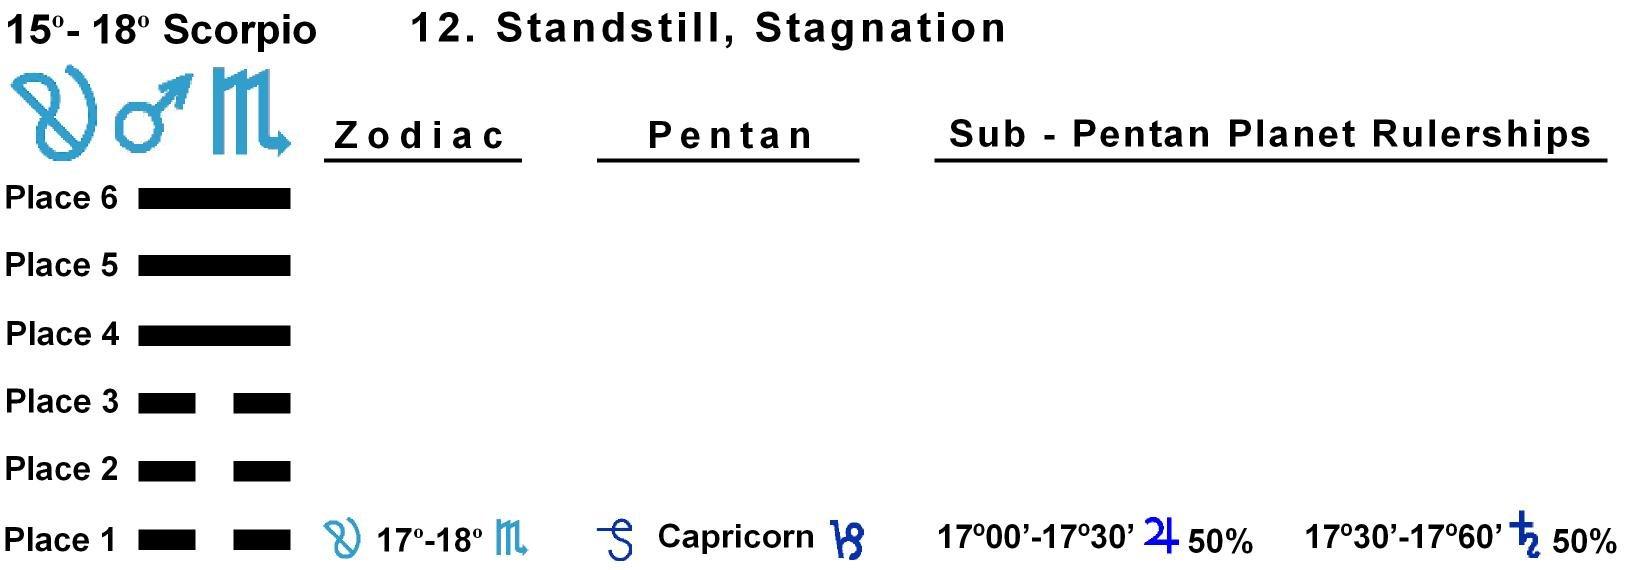 Pent-lines-08SC 17-18 Hx-12 Standstill